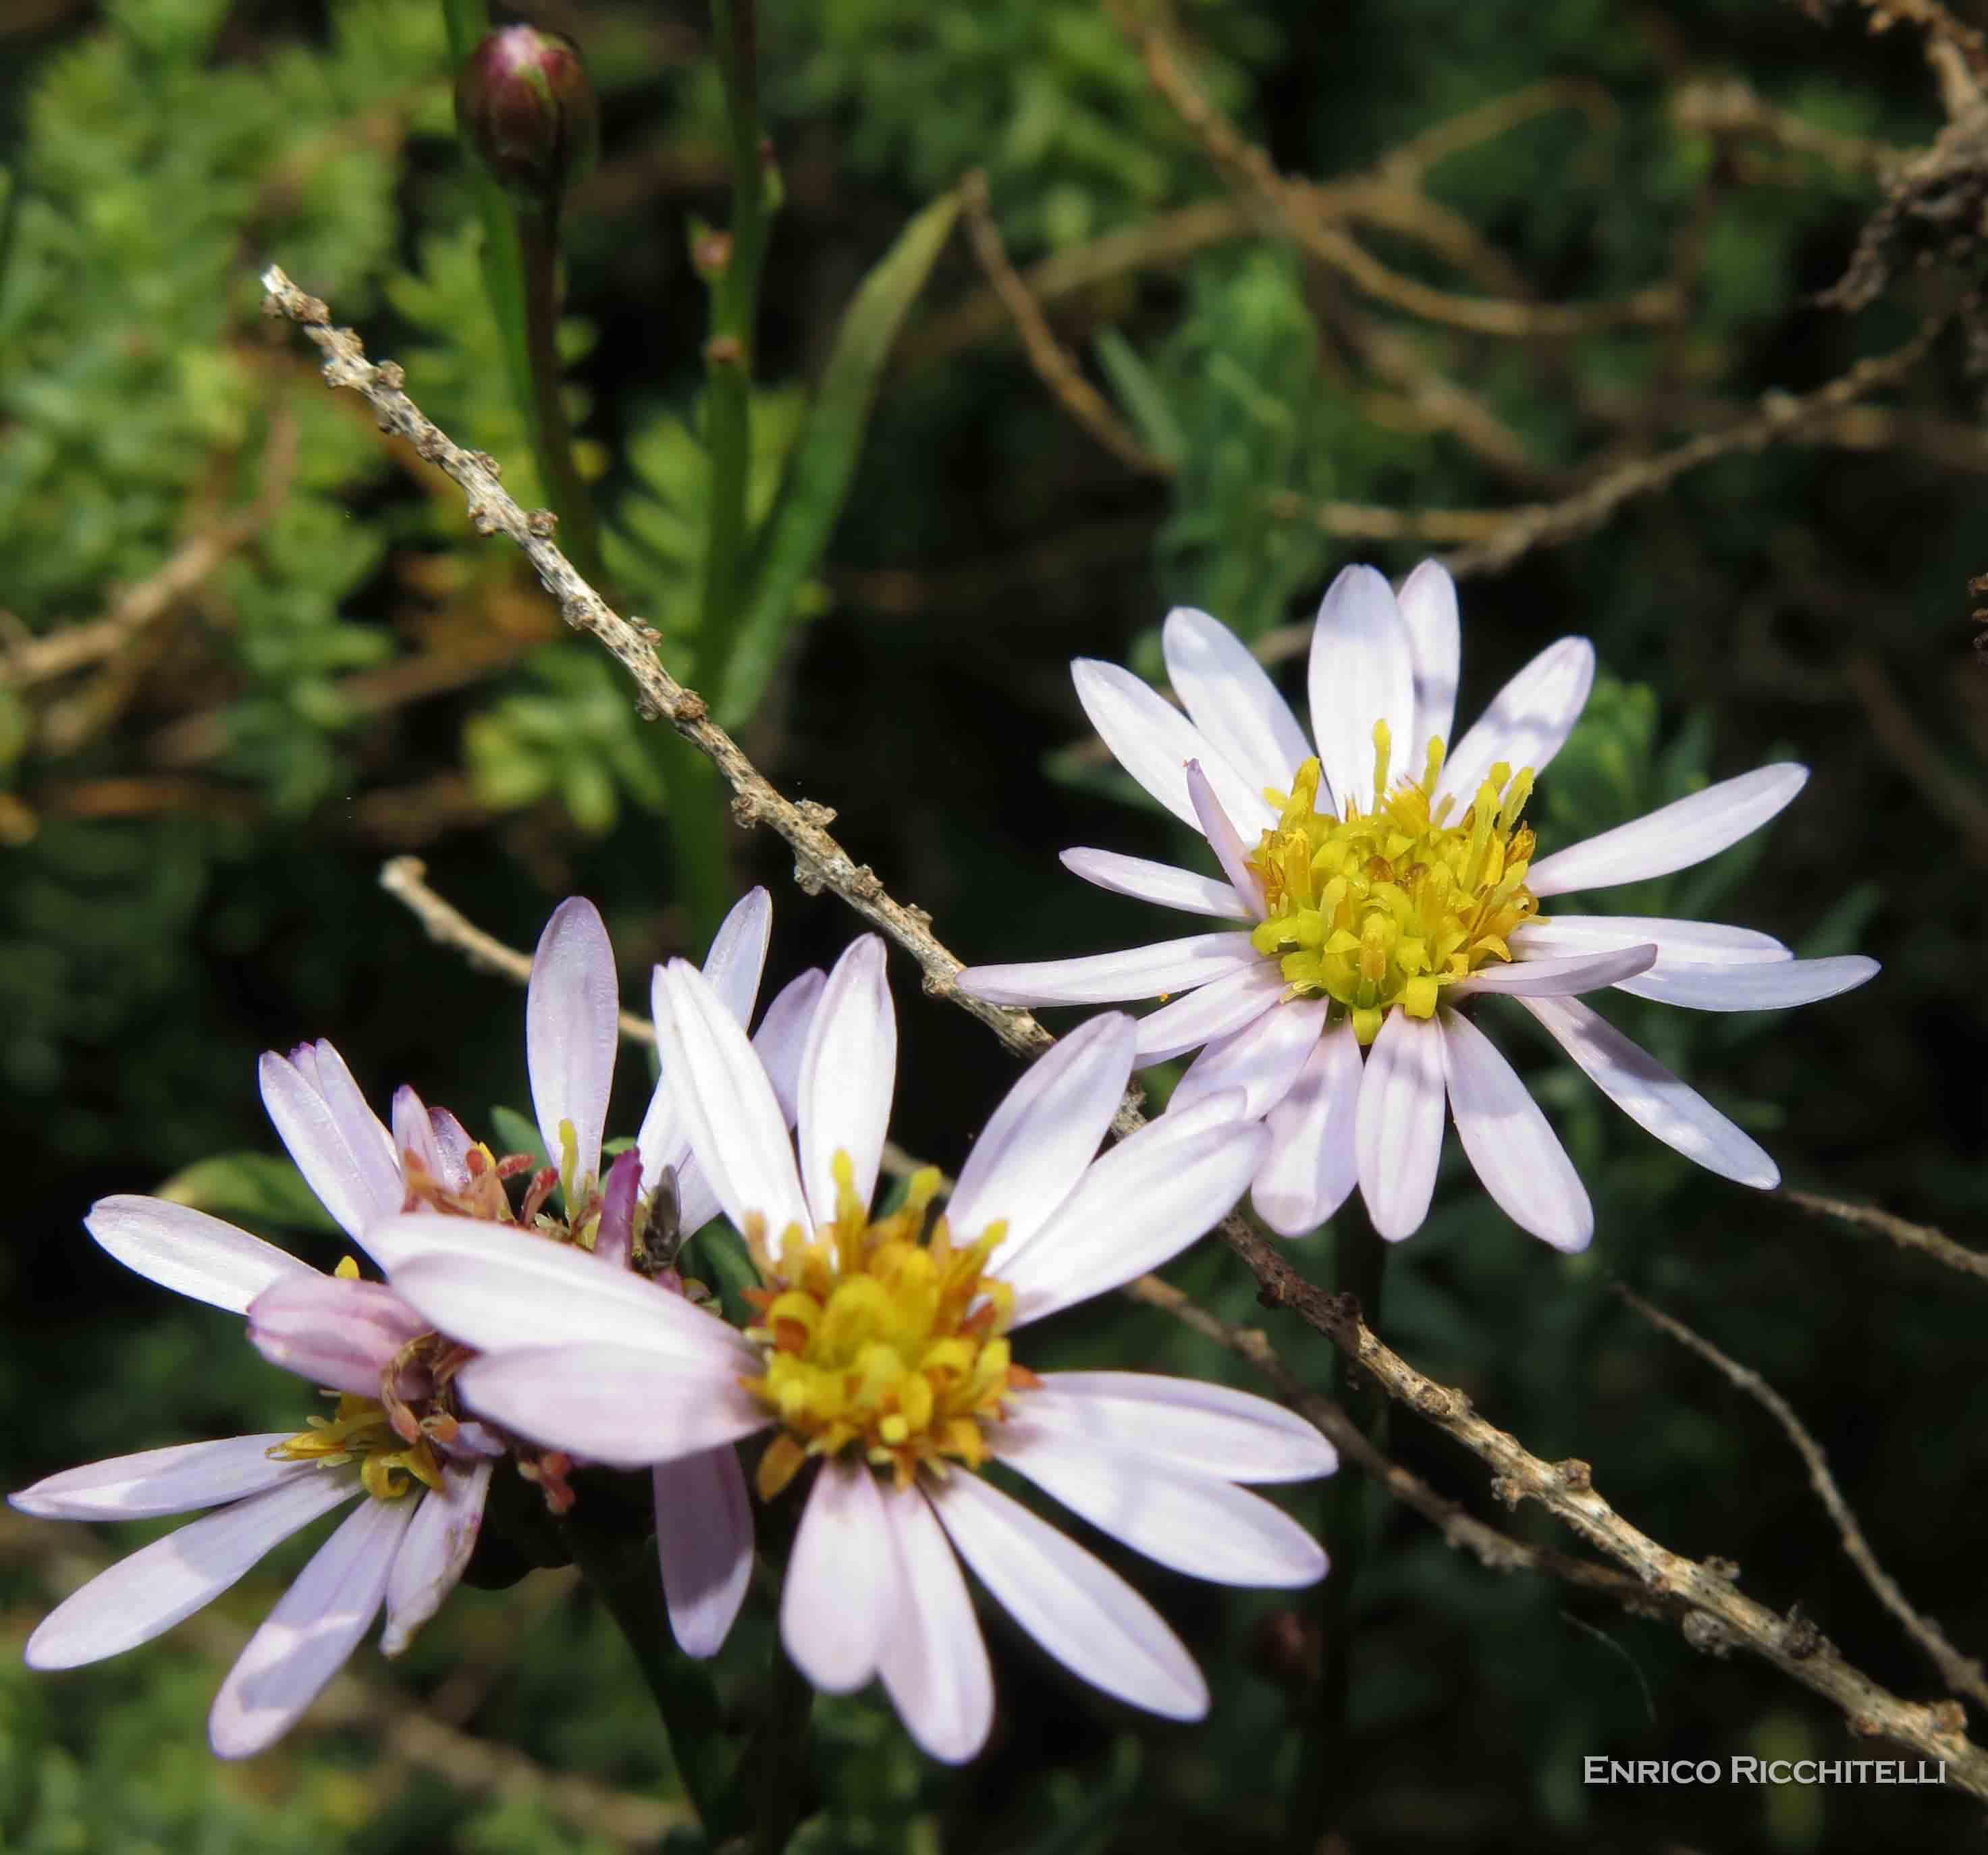 Galatella pannonica (=Aster tripolium) / Astro marino